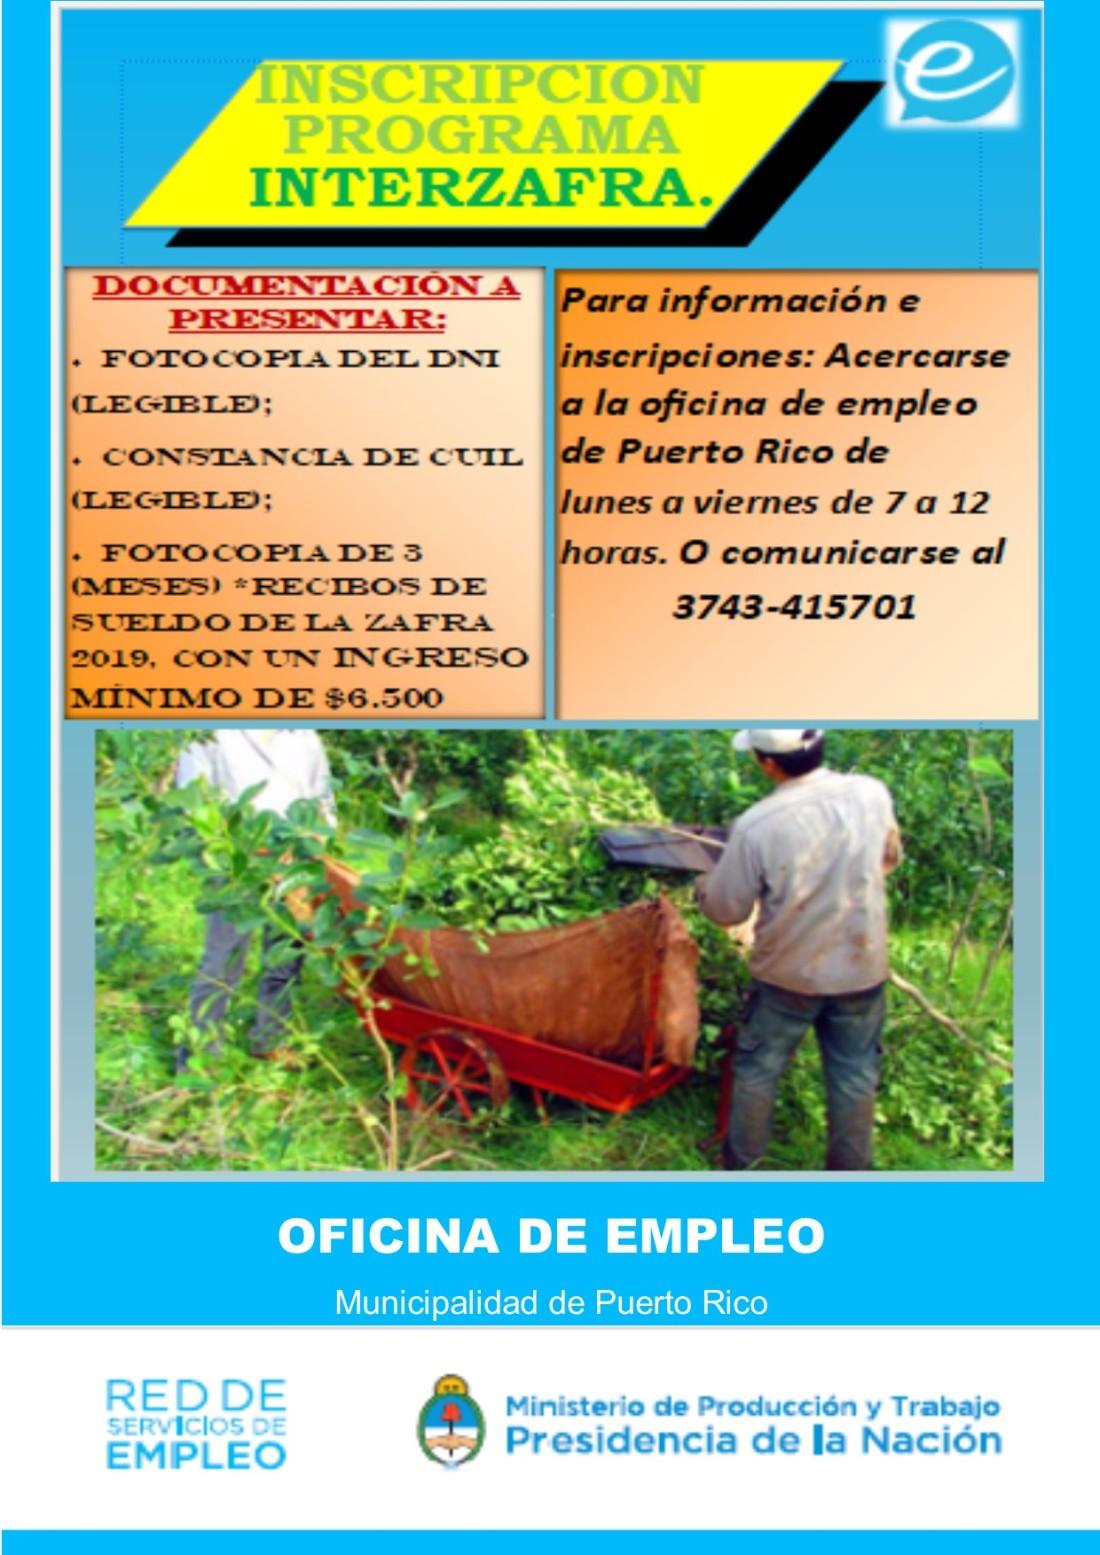 interzafra 2 (1)